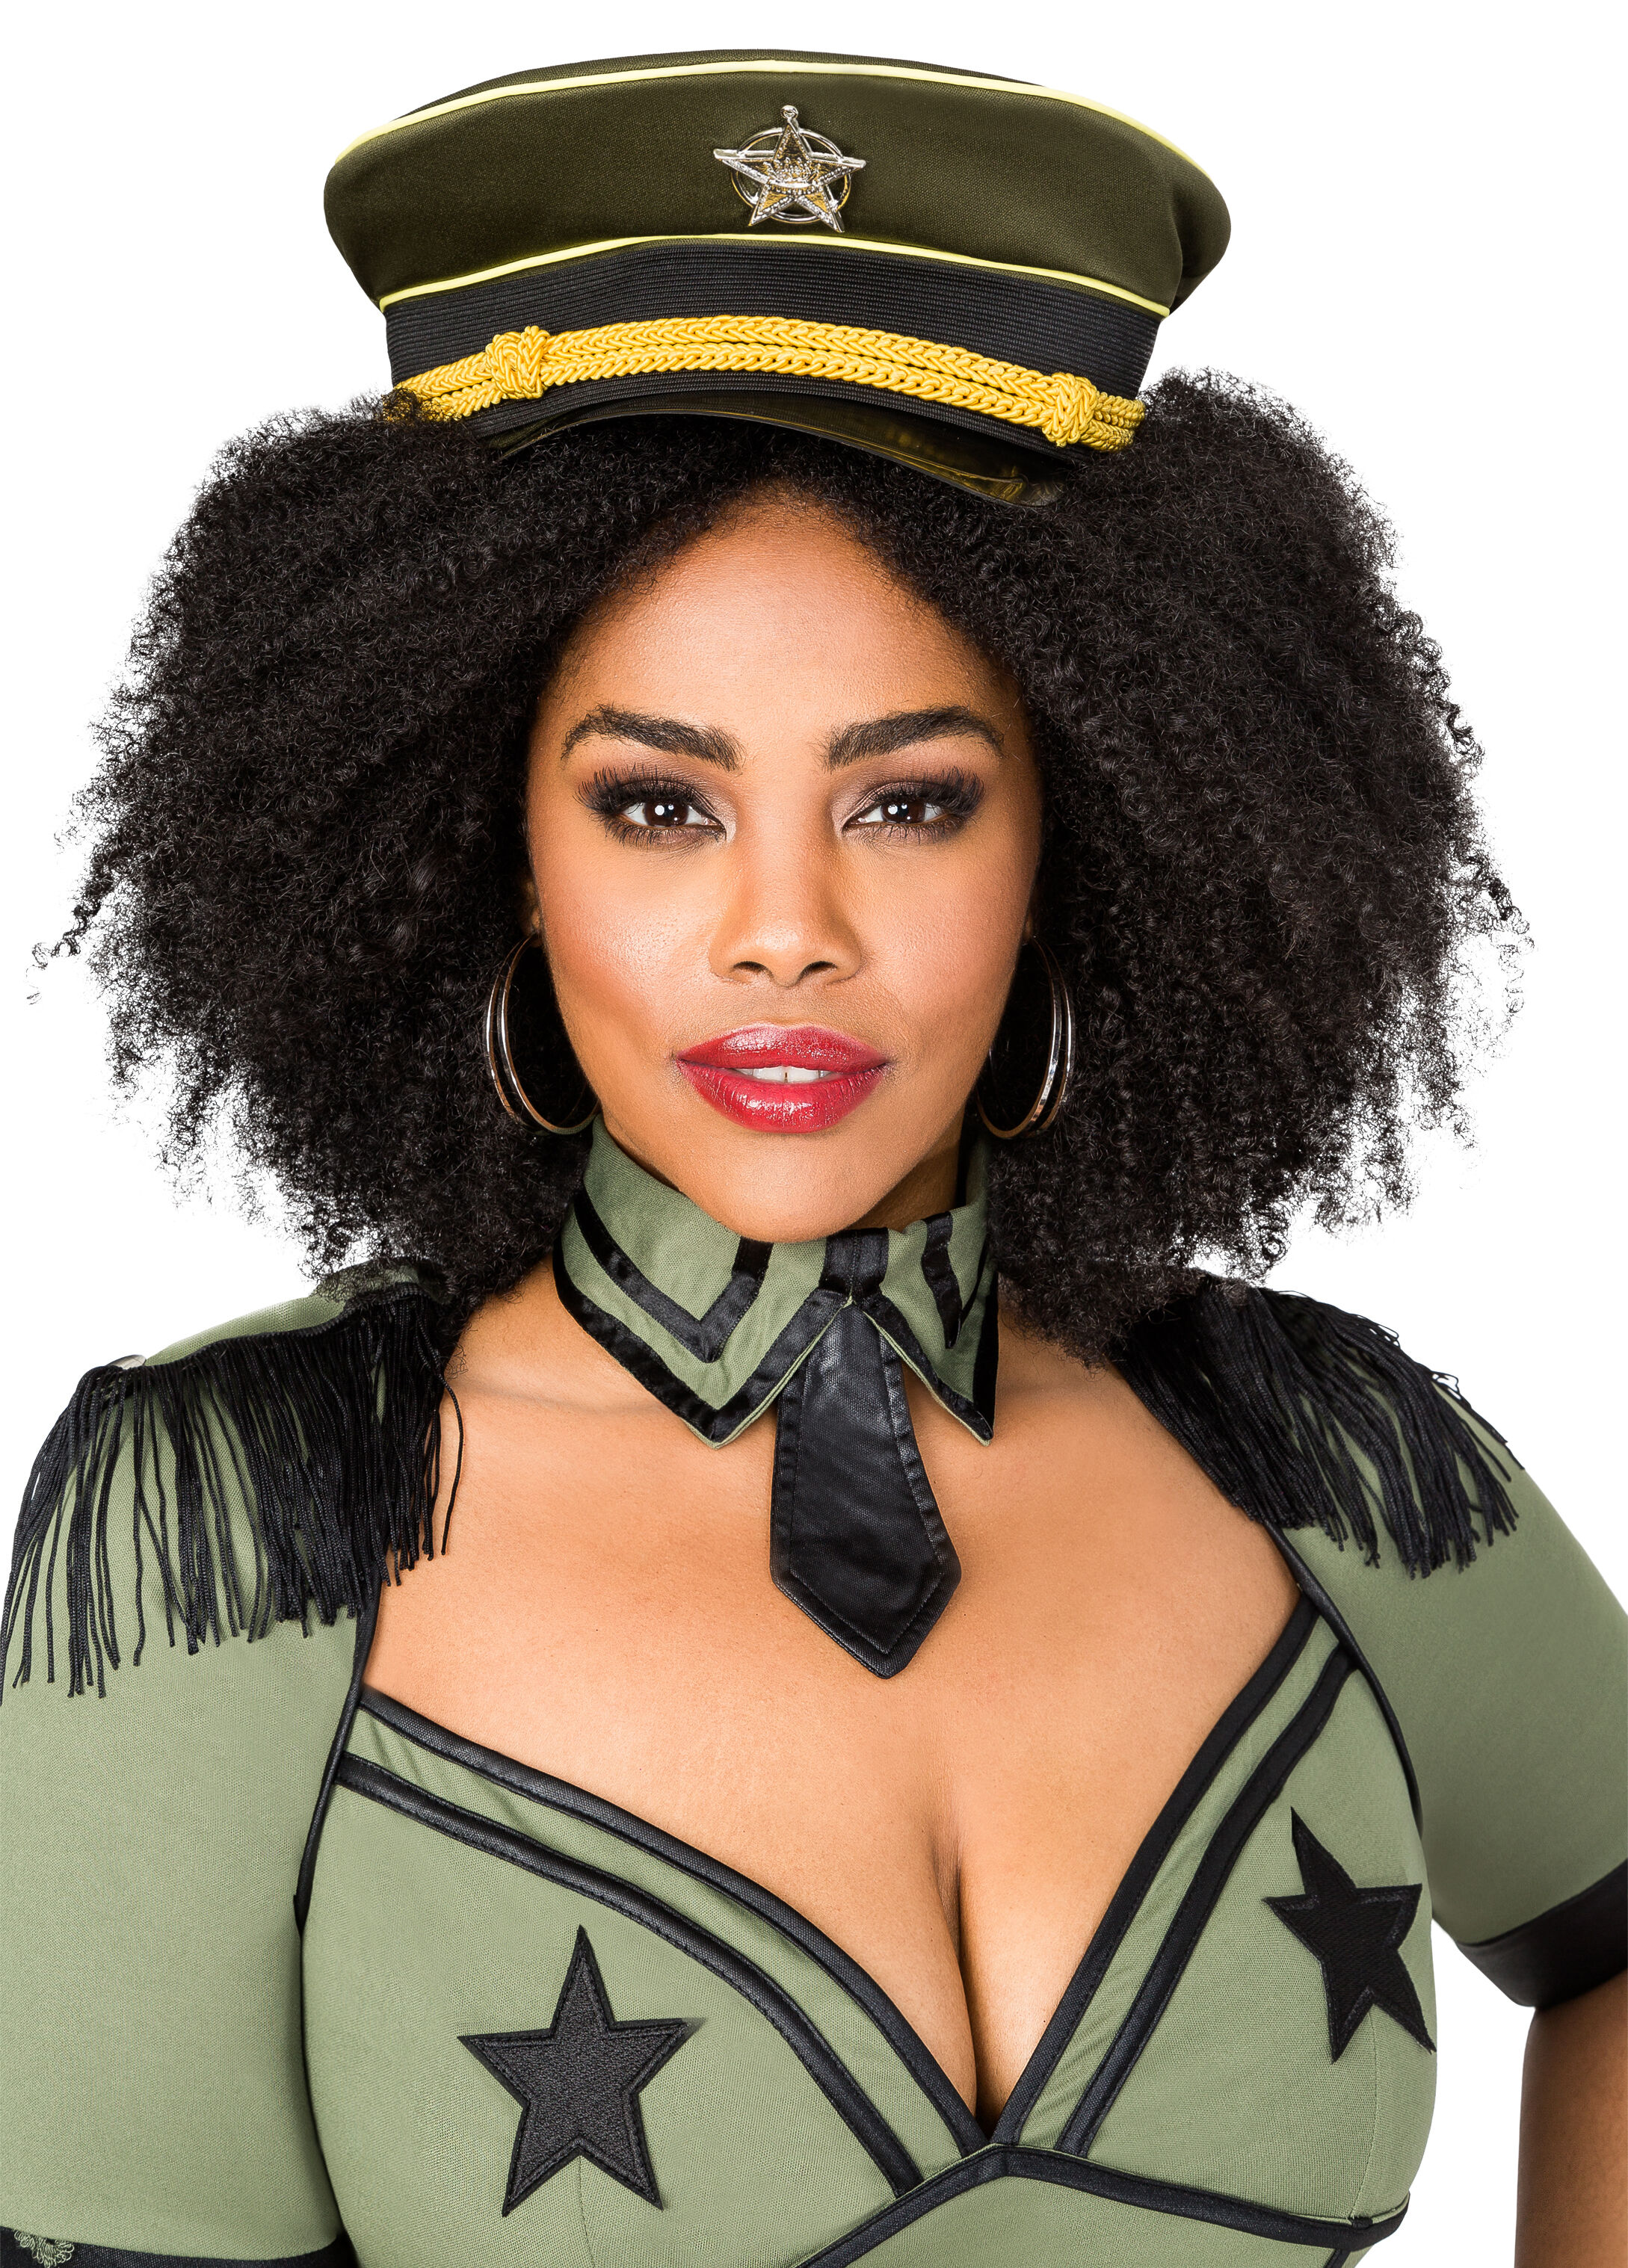 Sexy Army Brat Plus Size Costume